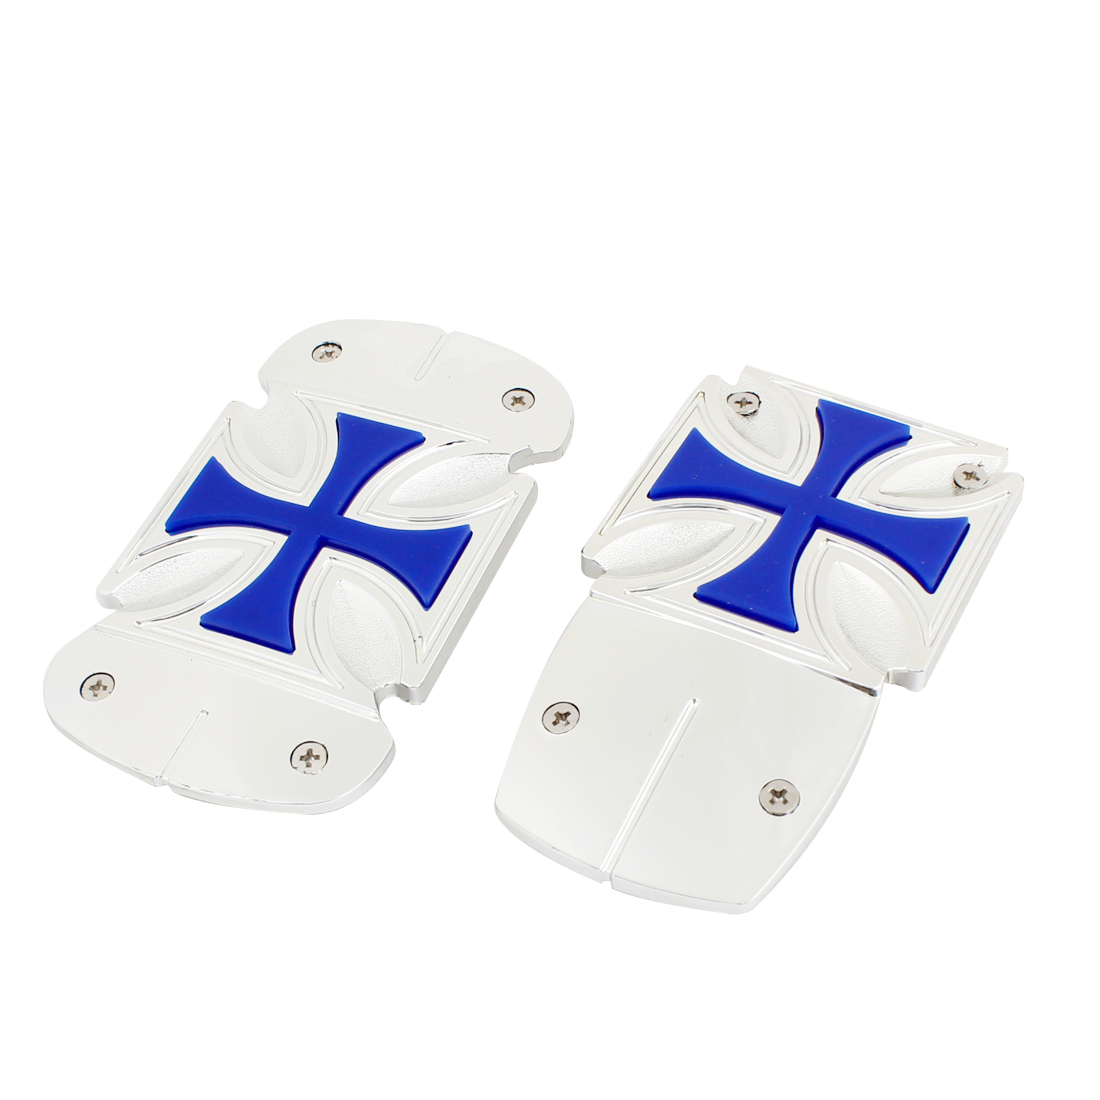 2x Silver Tone Blue Nonslip Gas Brake Pedal Protector Cover for Auto